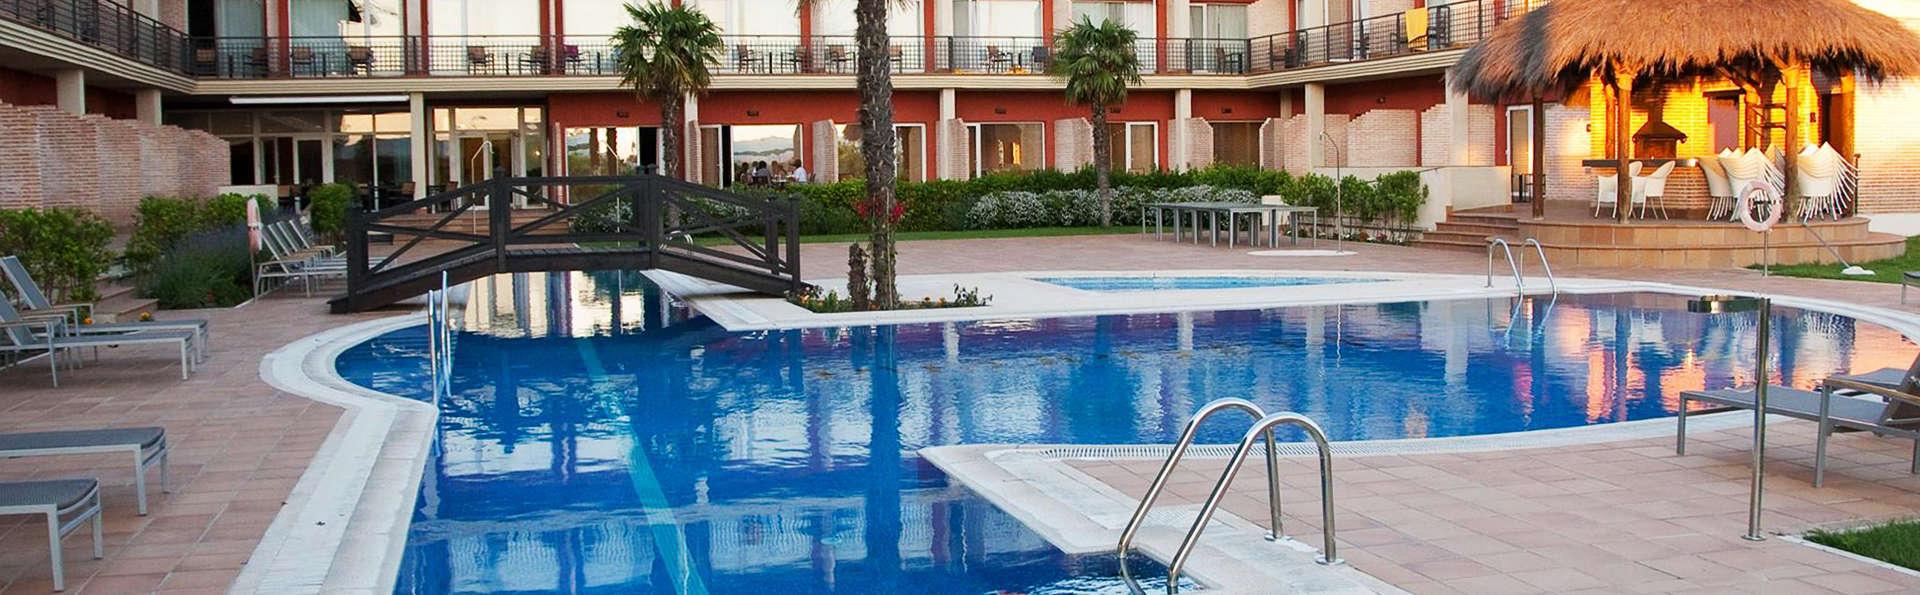 Hotel Isla de la Garena - EDIT_pool.jpg